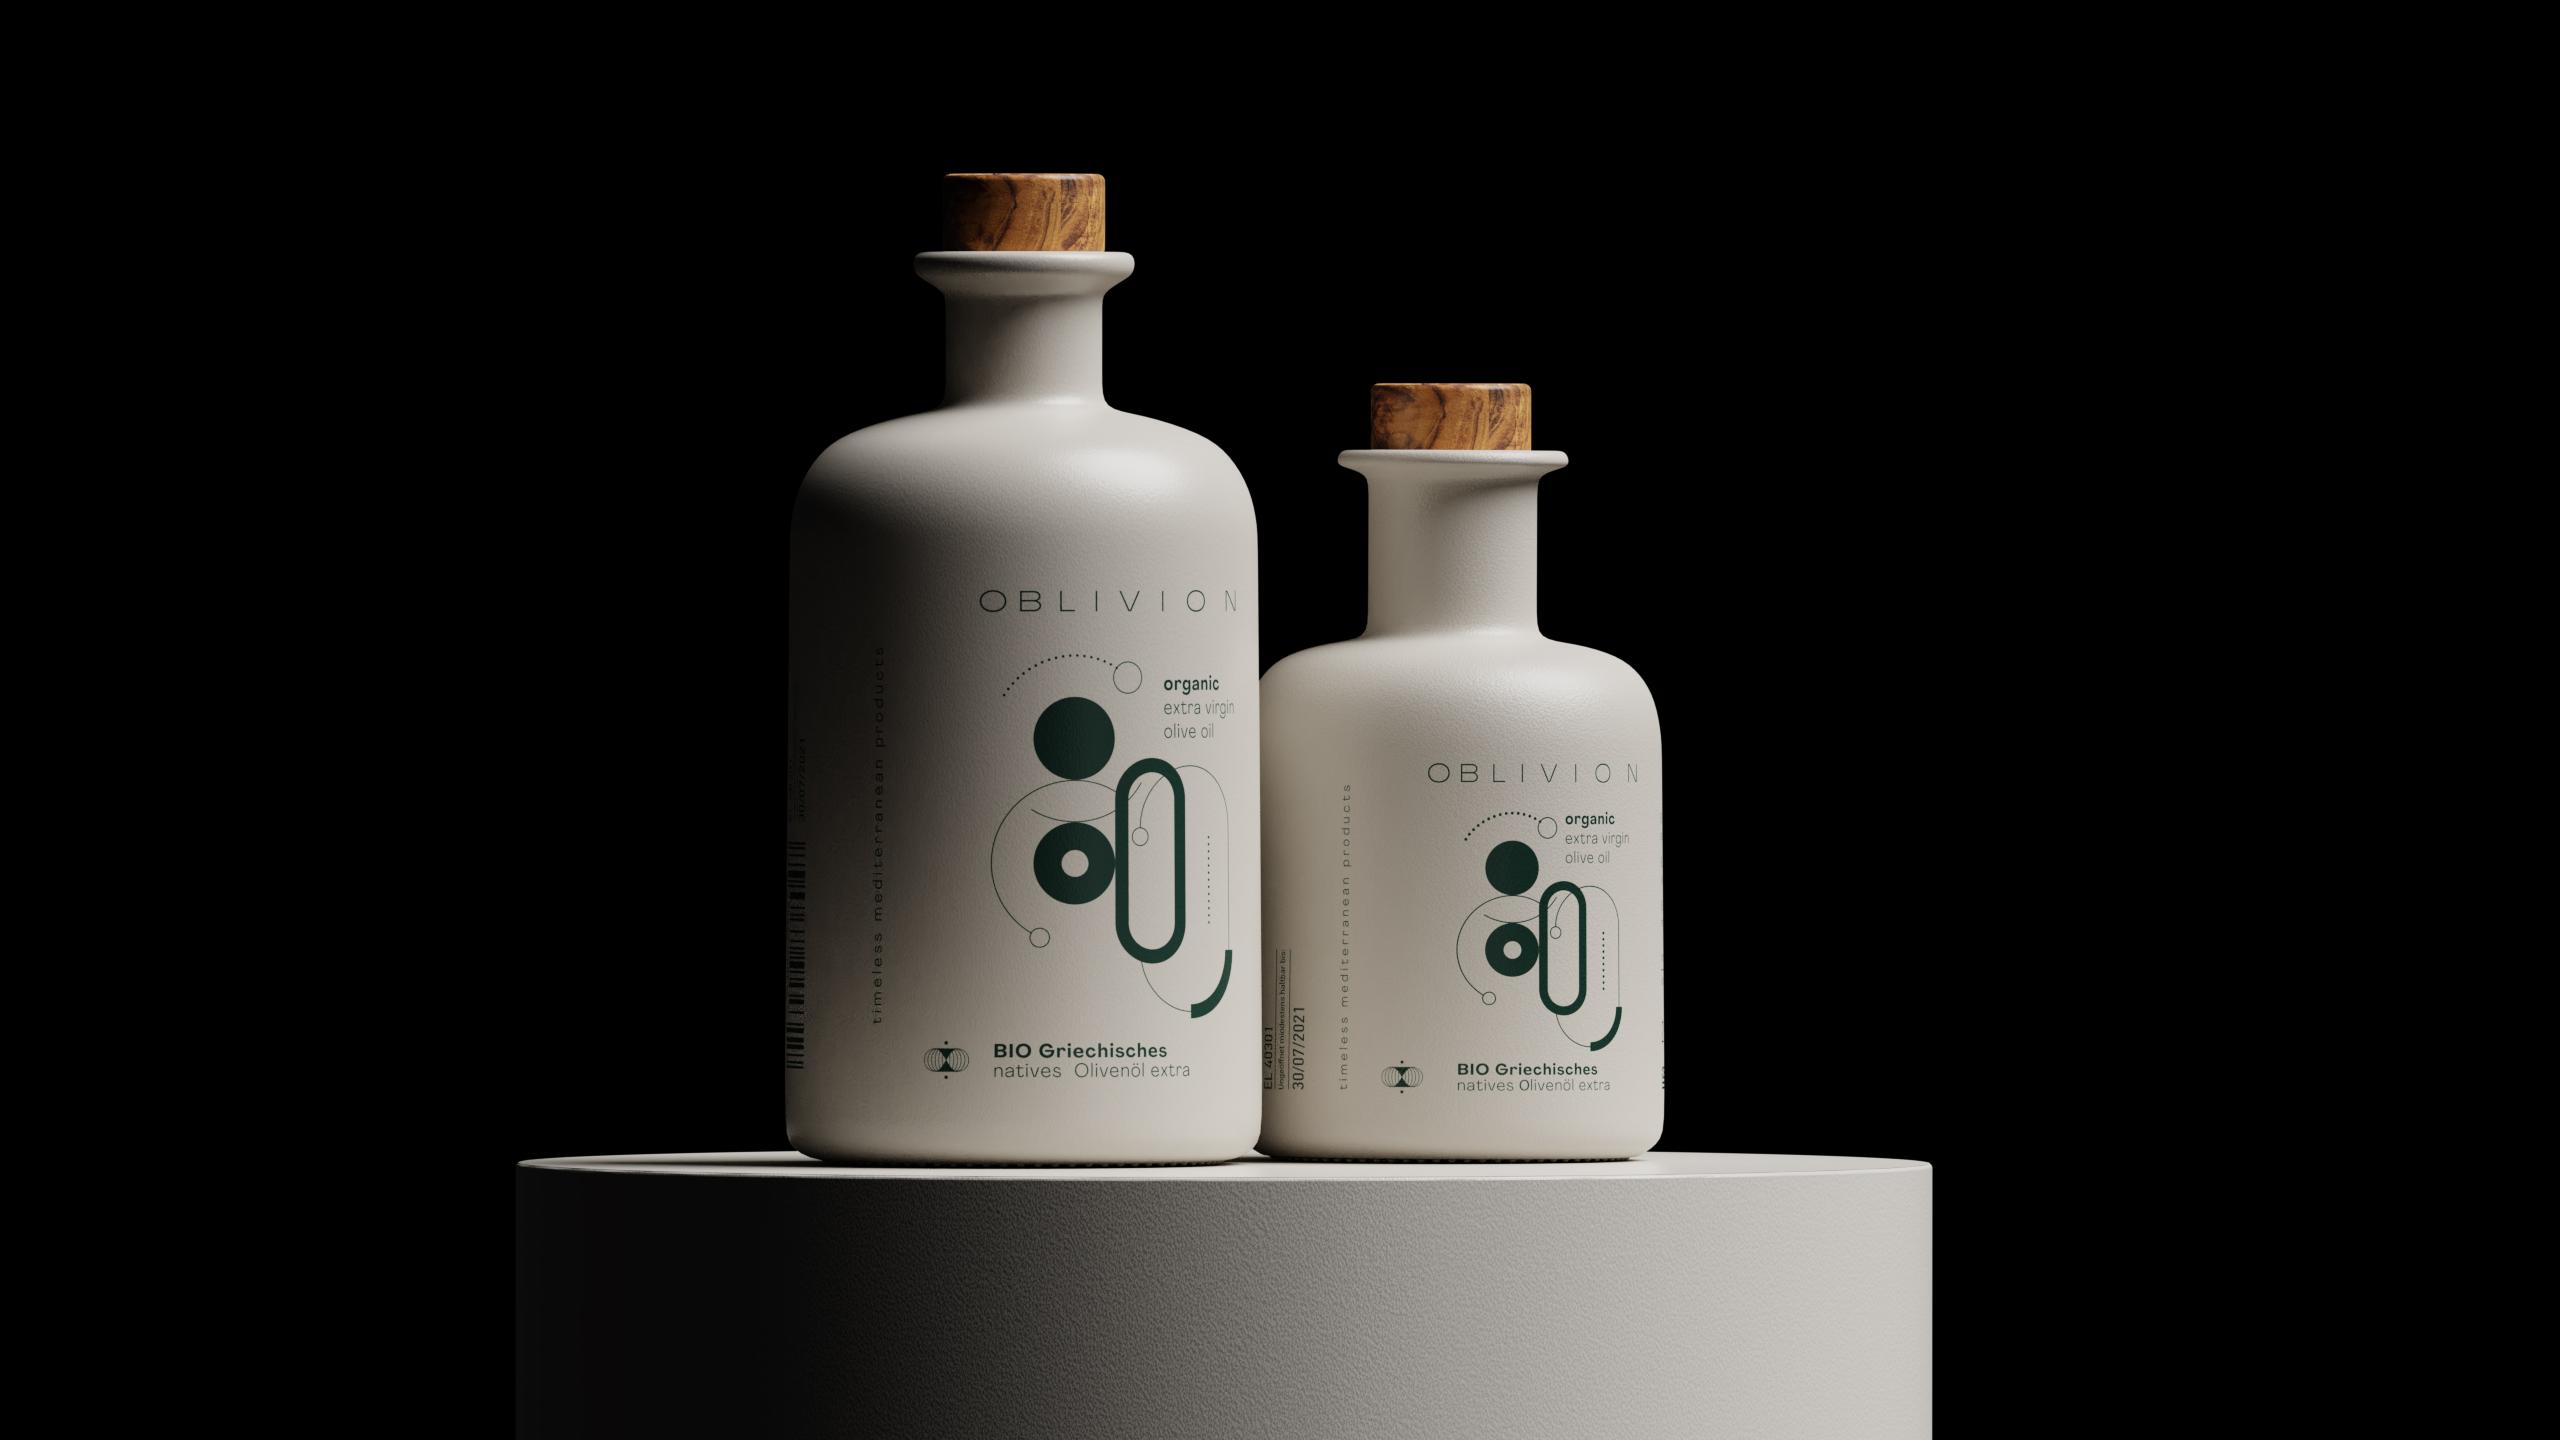 Artware Create Oblivion Organic Olive Oil Packaging Design